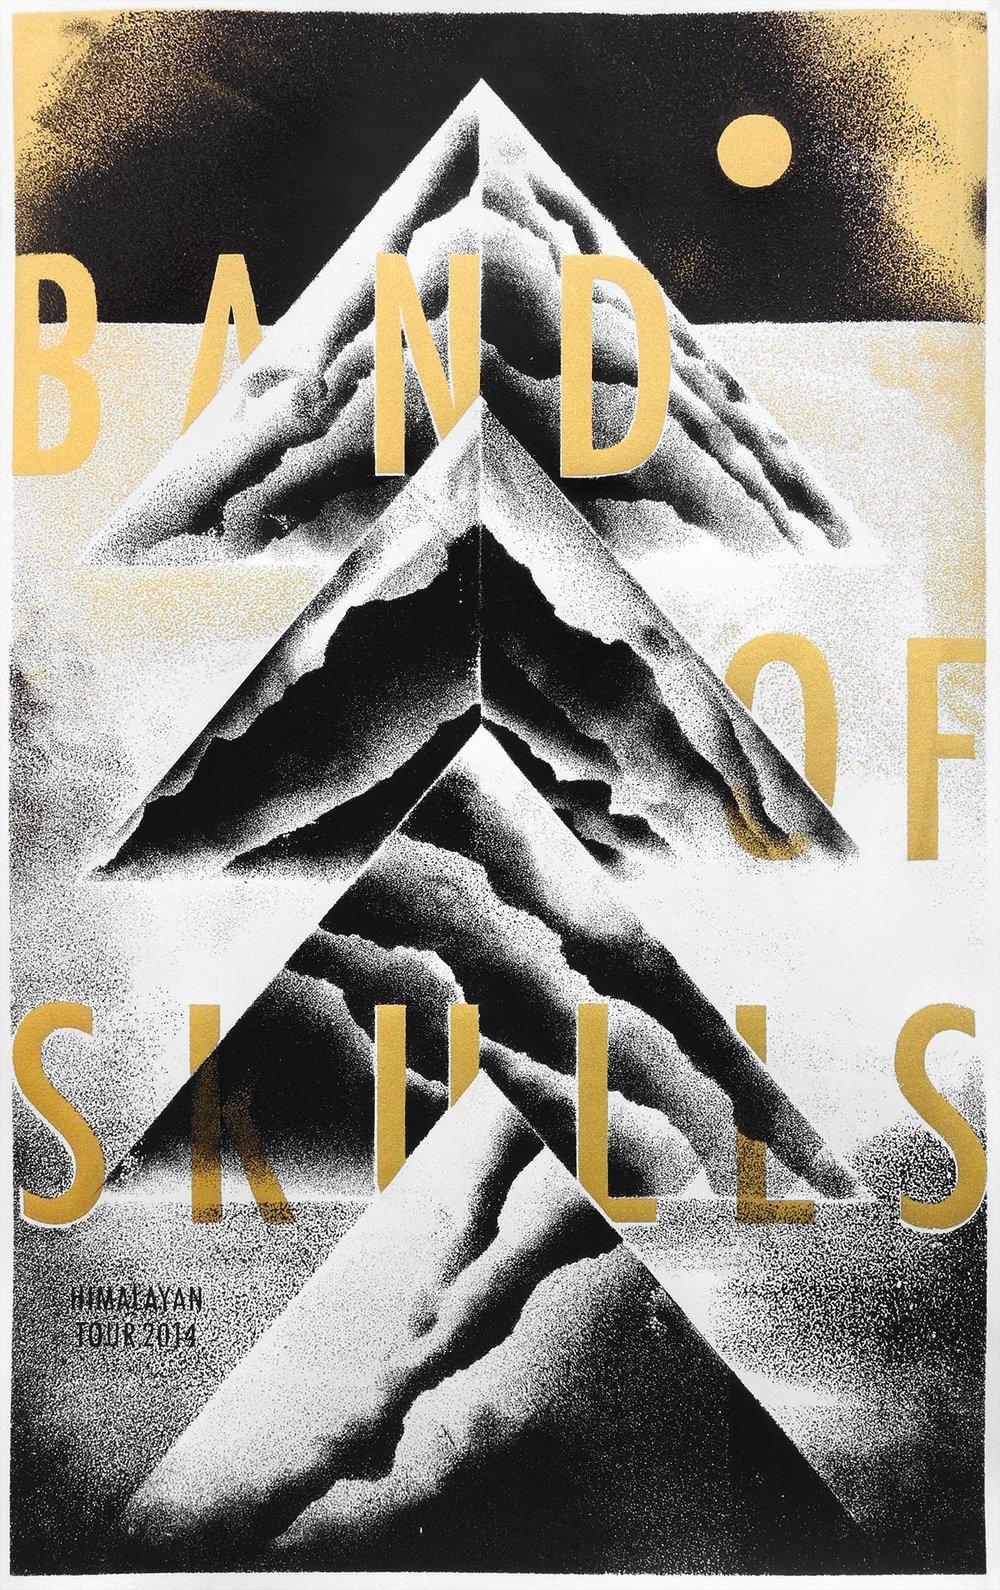 Image of BAND OF SKULLS 01